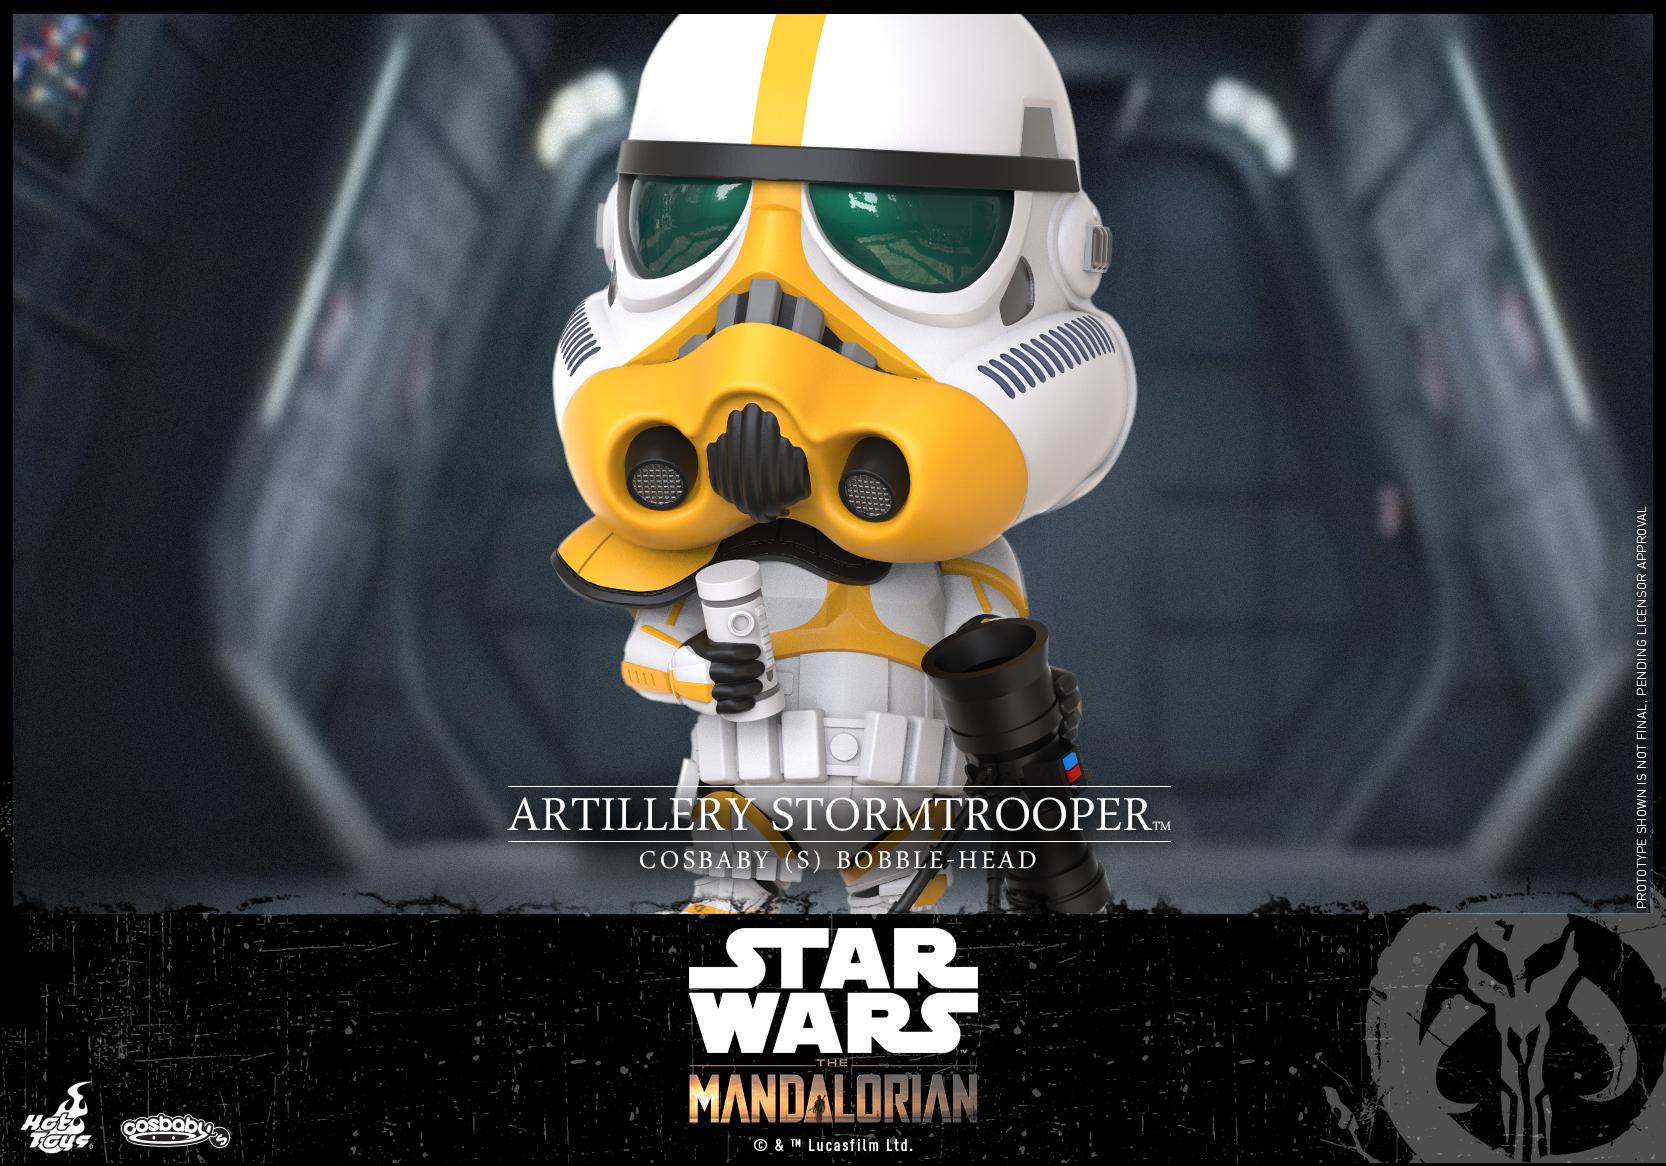 Hot Toys - Mandalorian II - Artillery Stormtrooper Cosbaby_PR2